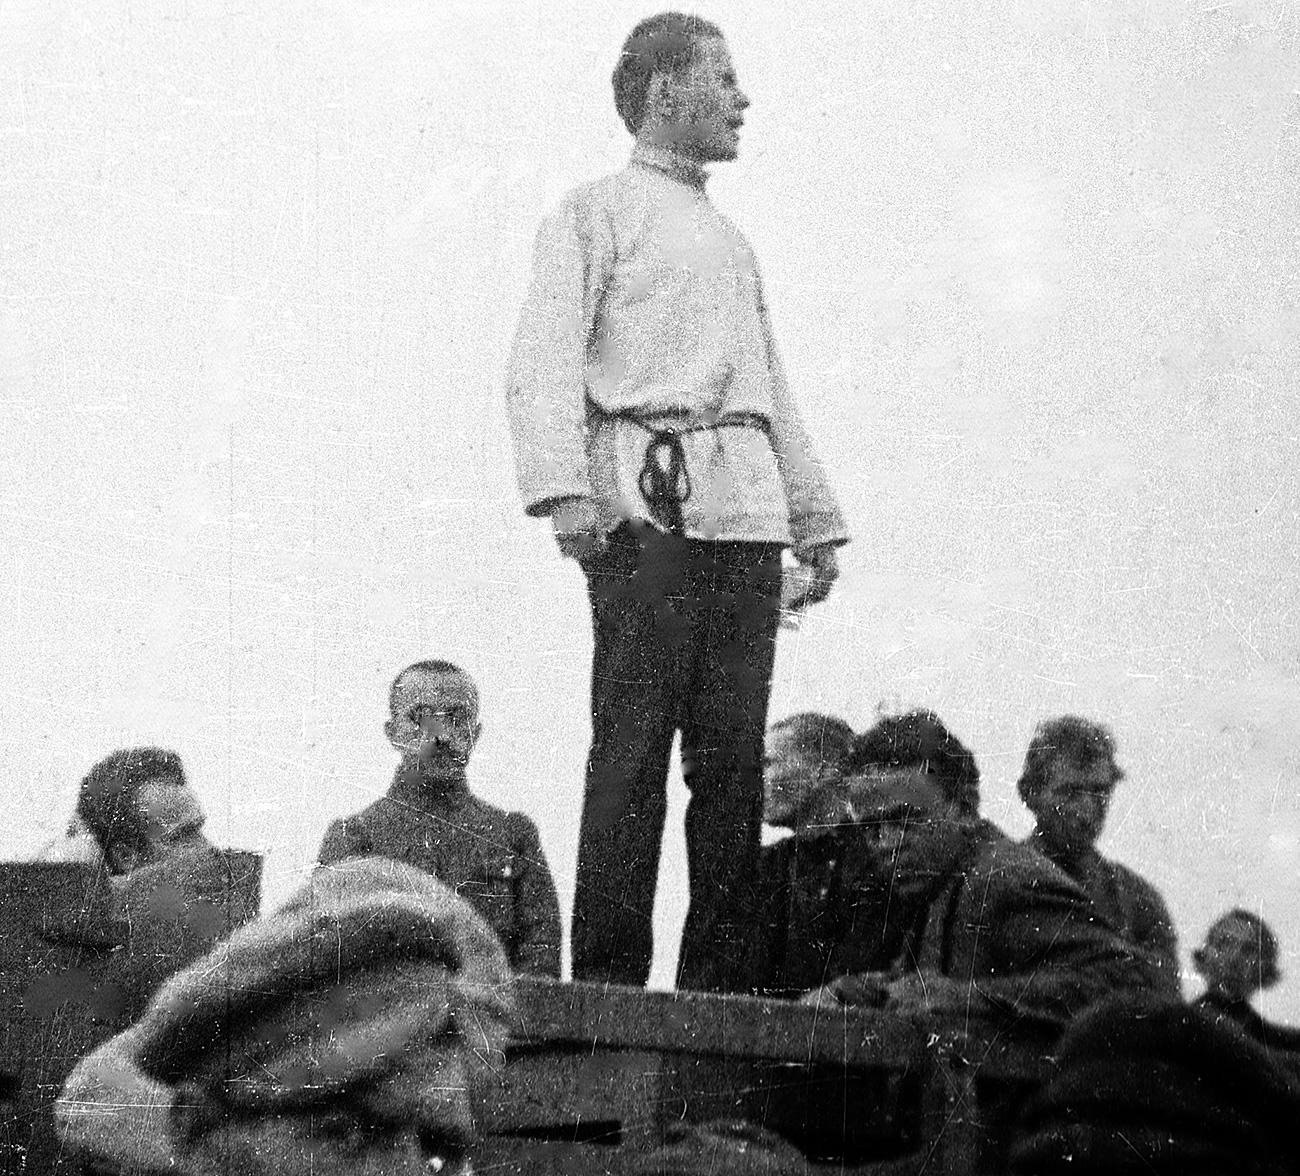 John Reed em uma greve em Nakhichevan. / RIA Nôvosti